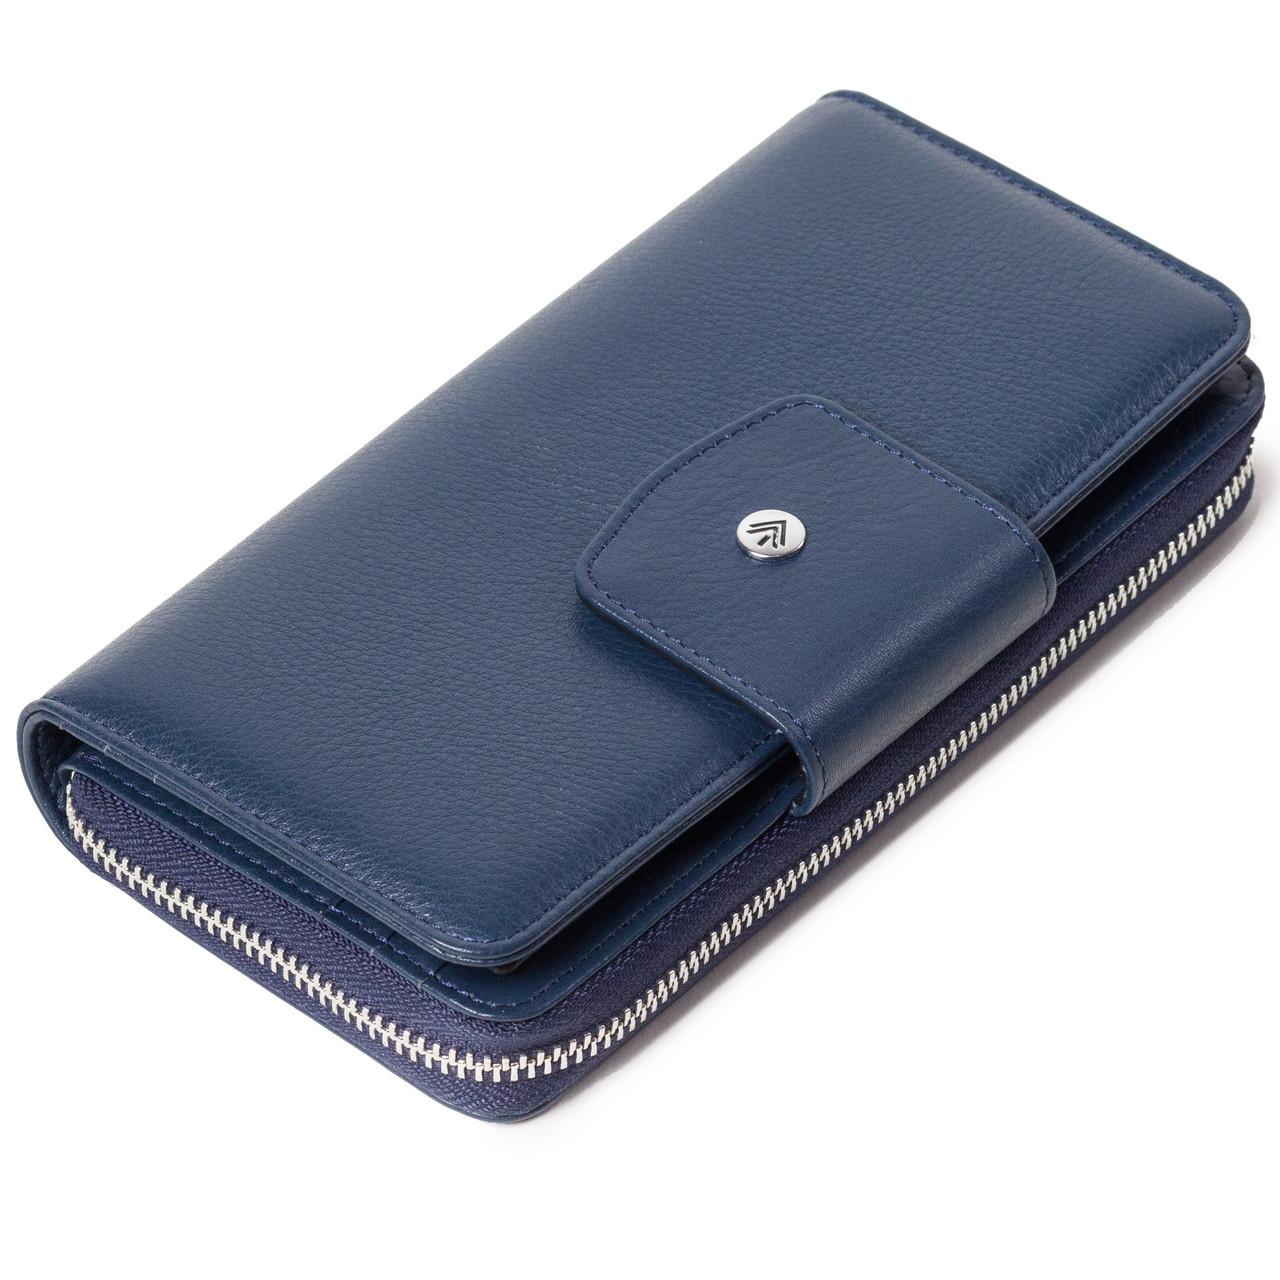 Женский кошелек Eminsa 2149-18-19 кожаный синий